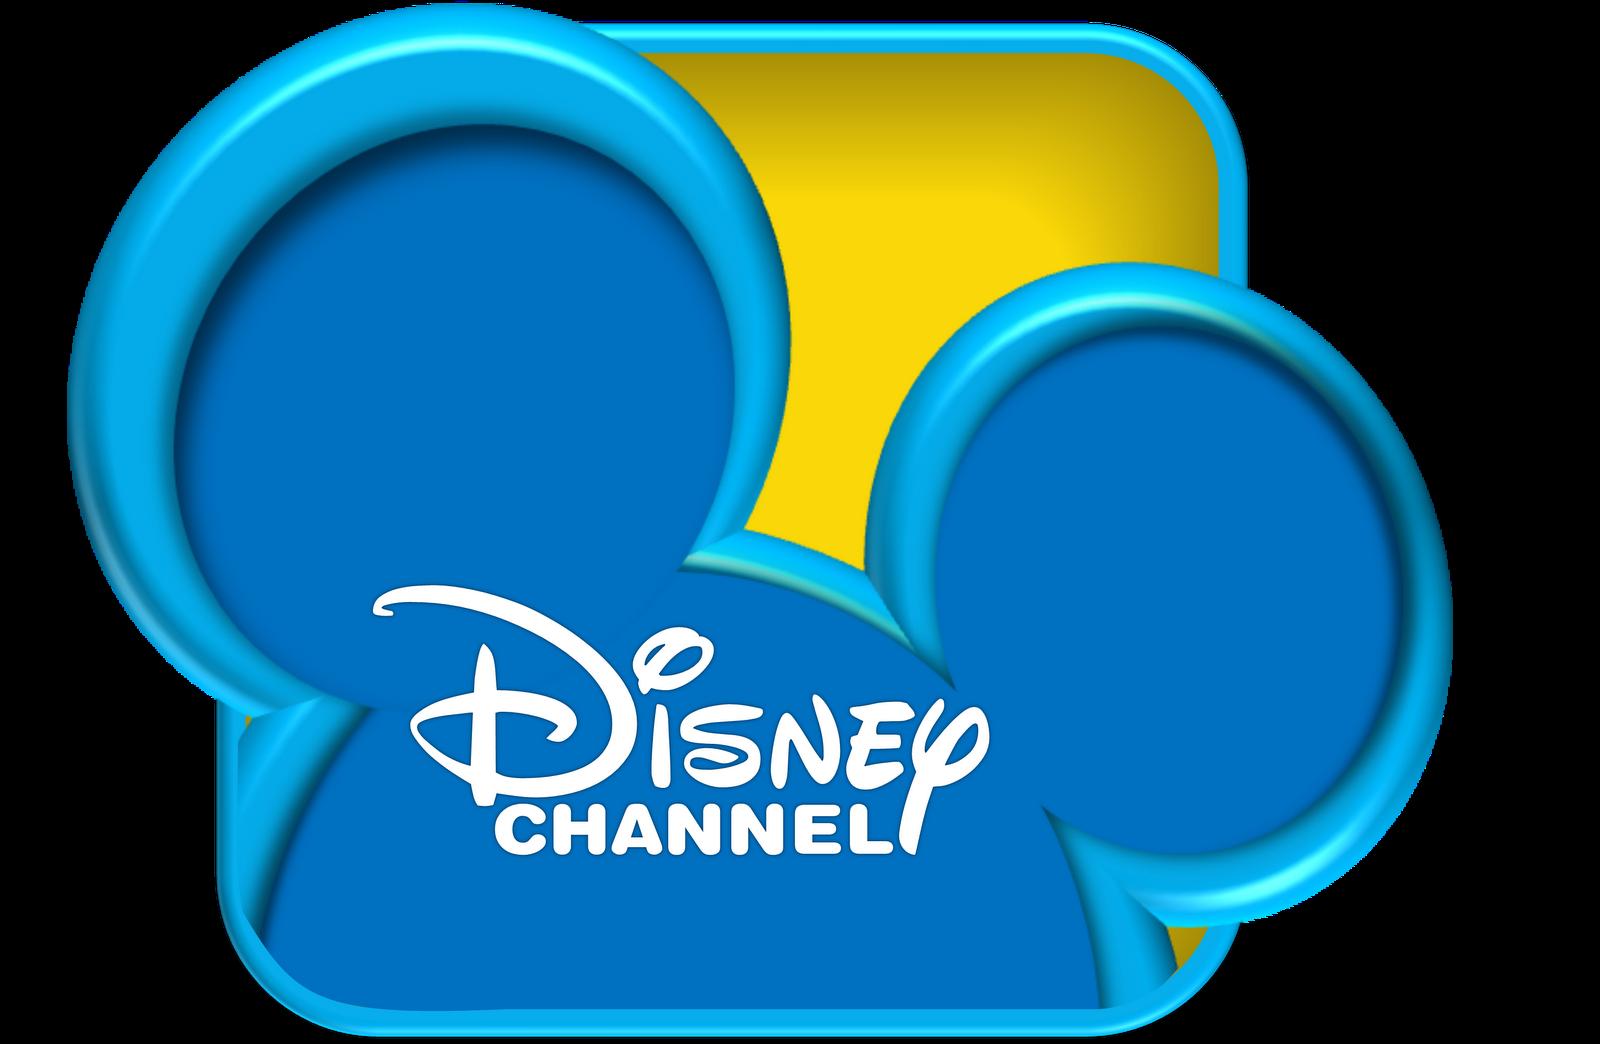 Disney_Channel.jpg